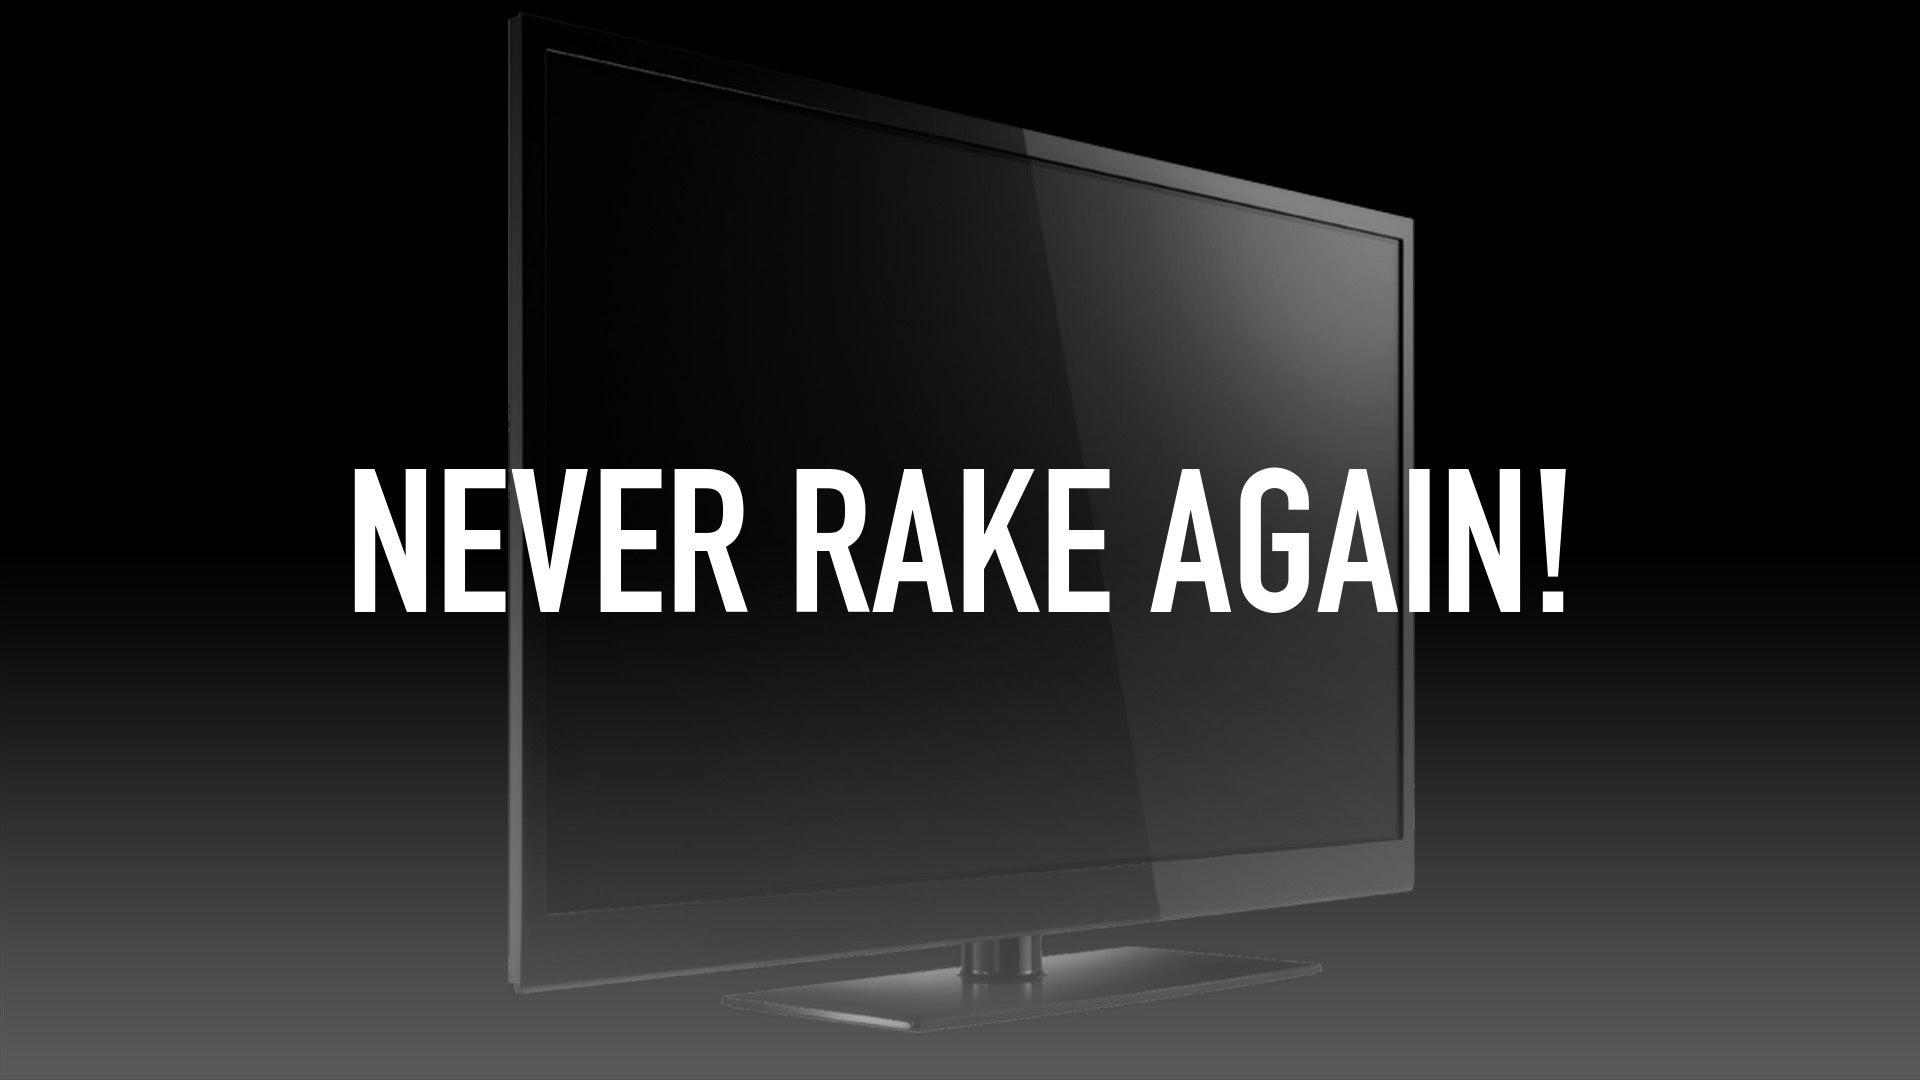 Never Rake Again!